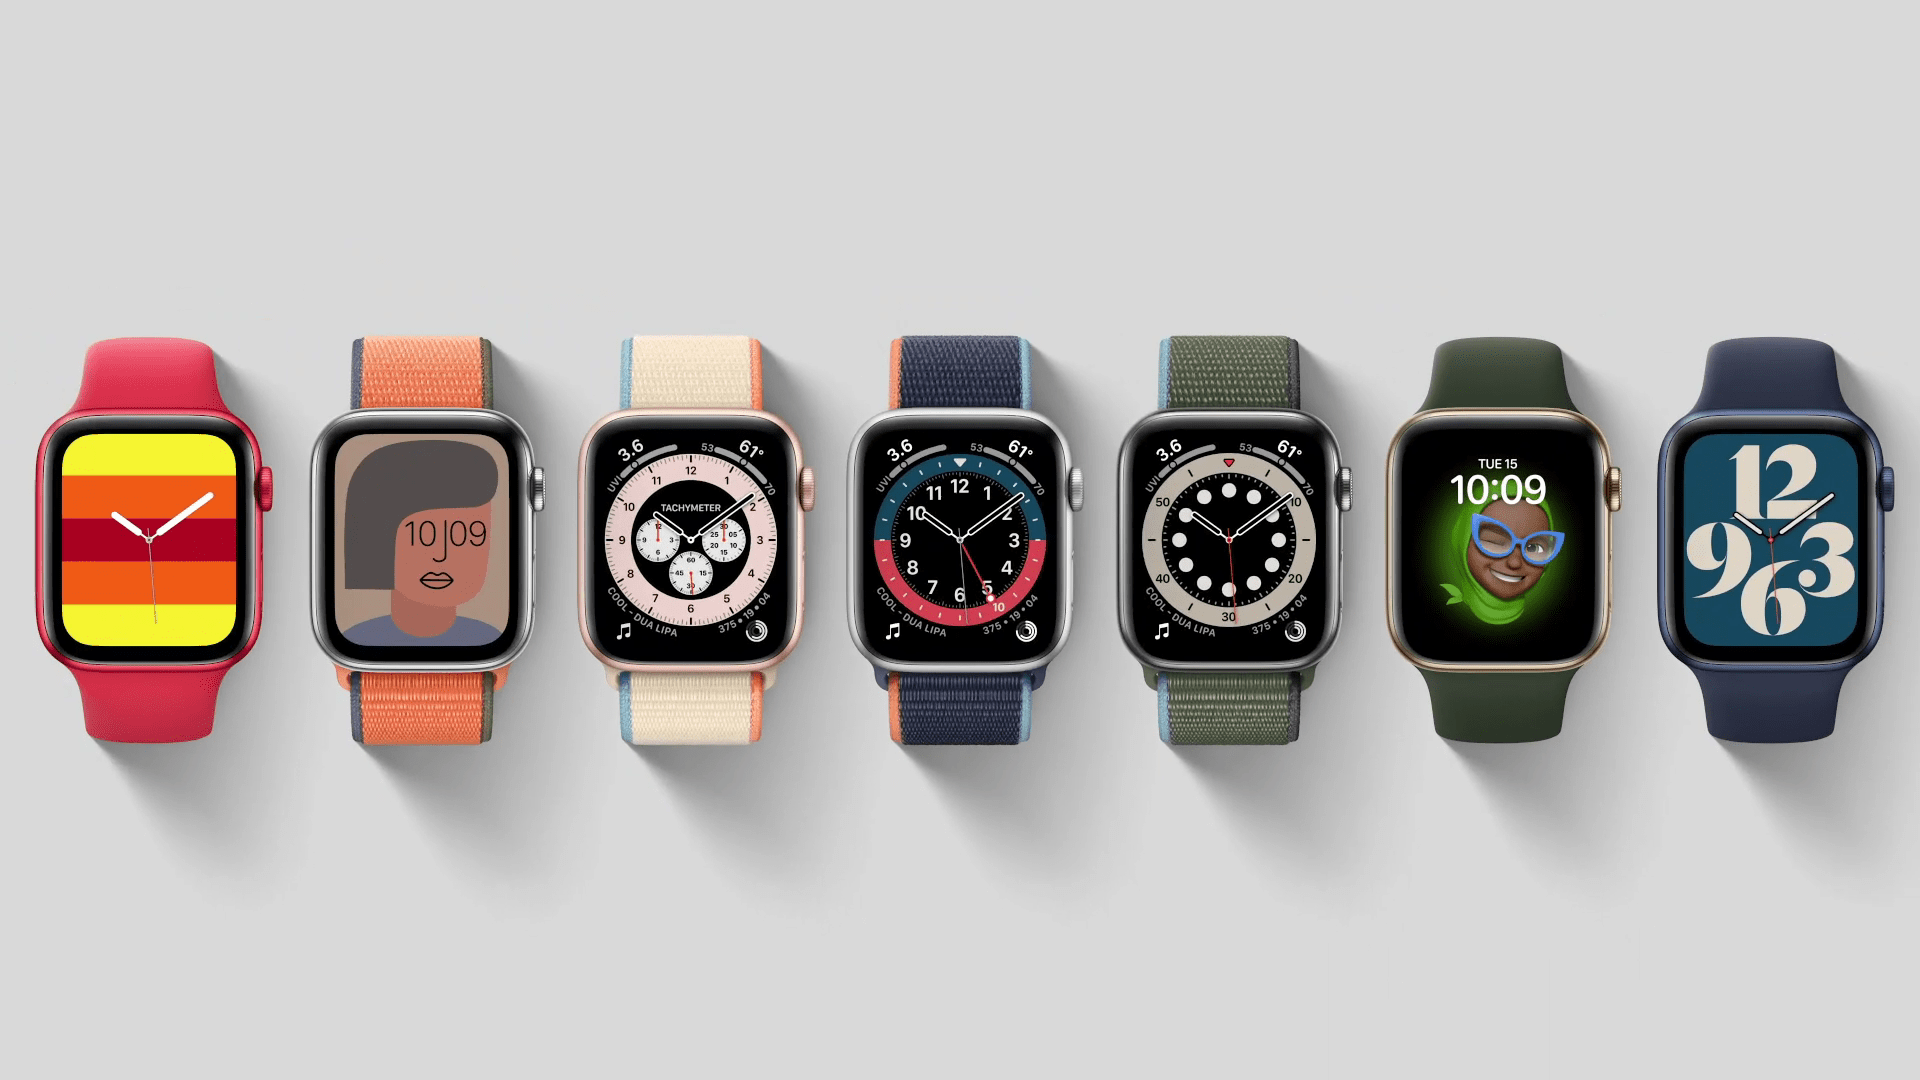 Apple Представила Apple Watch Series 6, Apple Watch SE: Цена в России, Дата Выхода